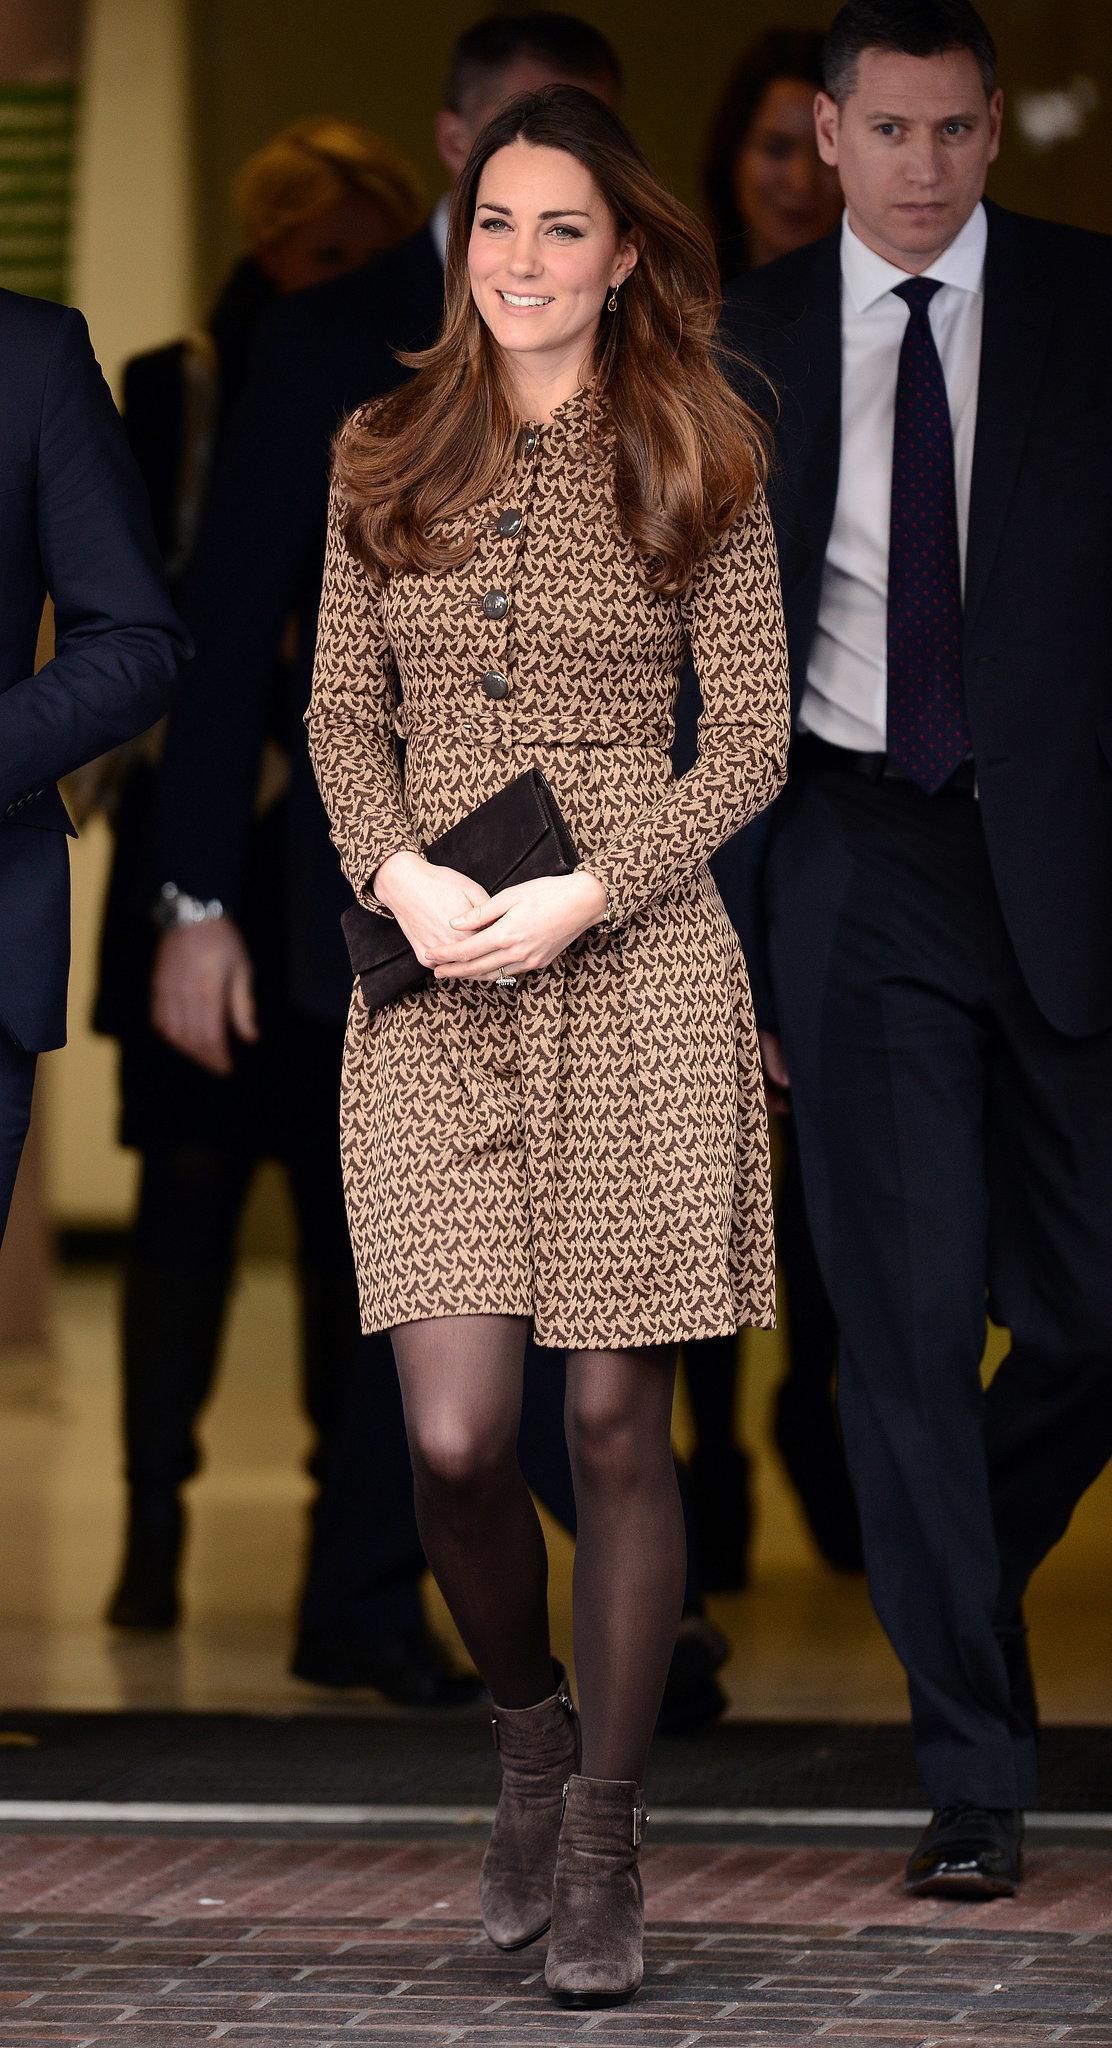 Kate Middleton in an Orla Kiely Dress